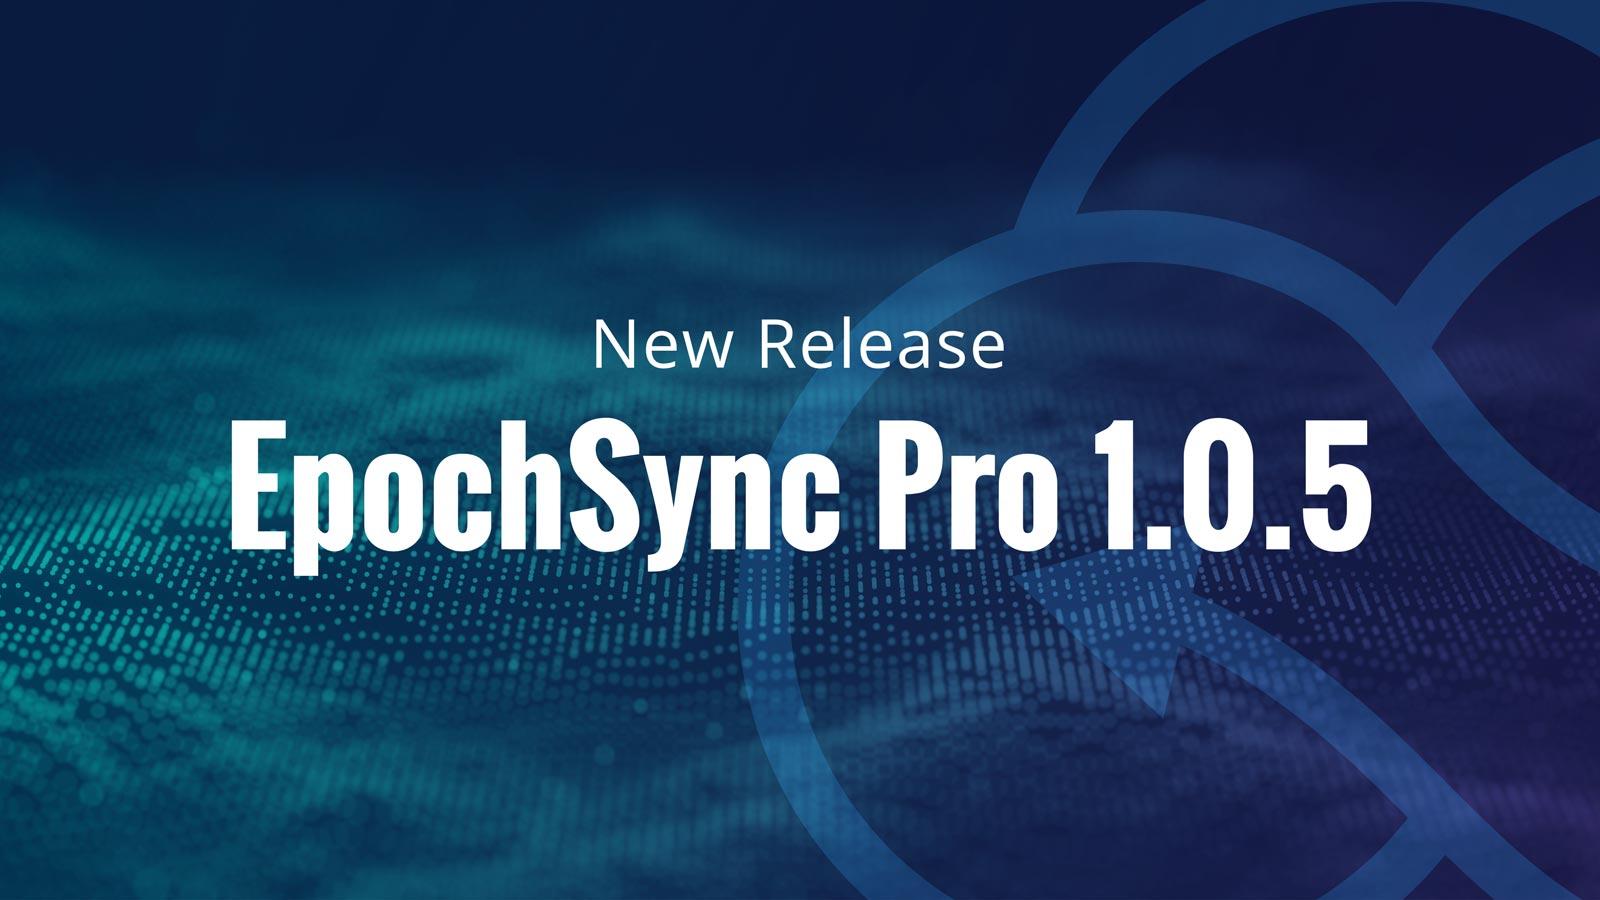 Just Announced: EpochSync Pro 1.0.5